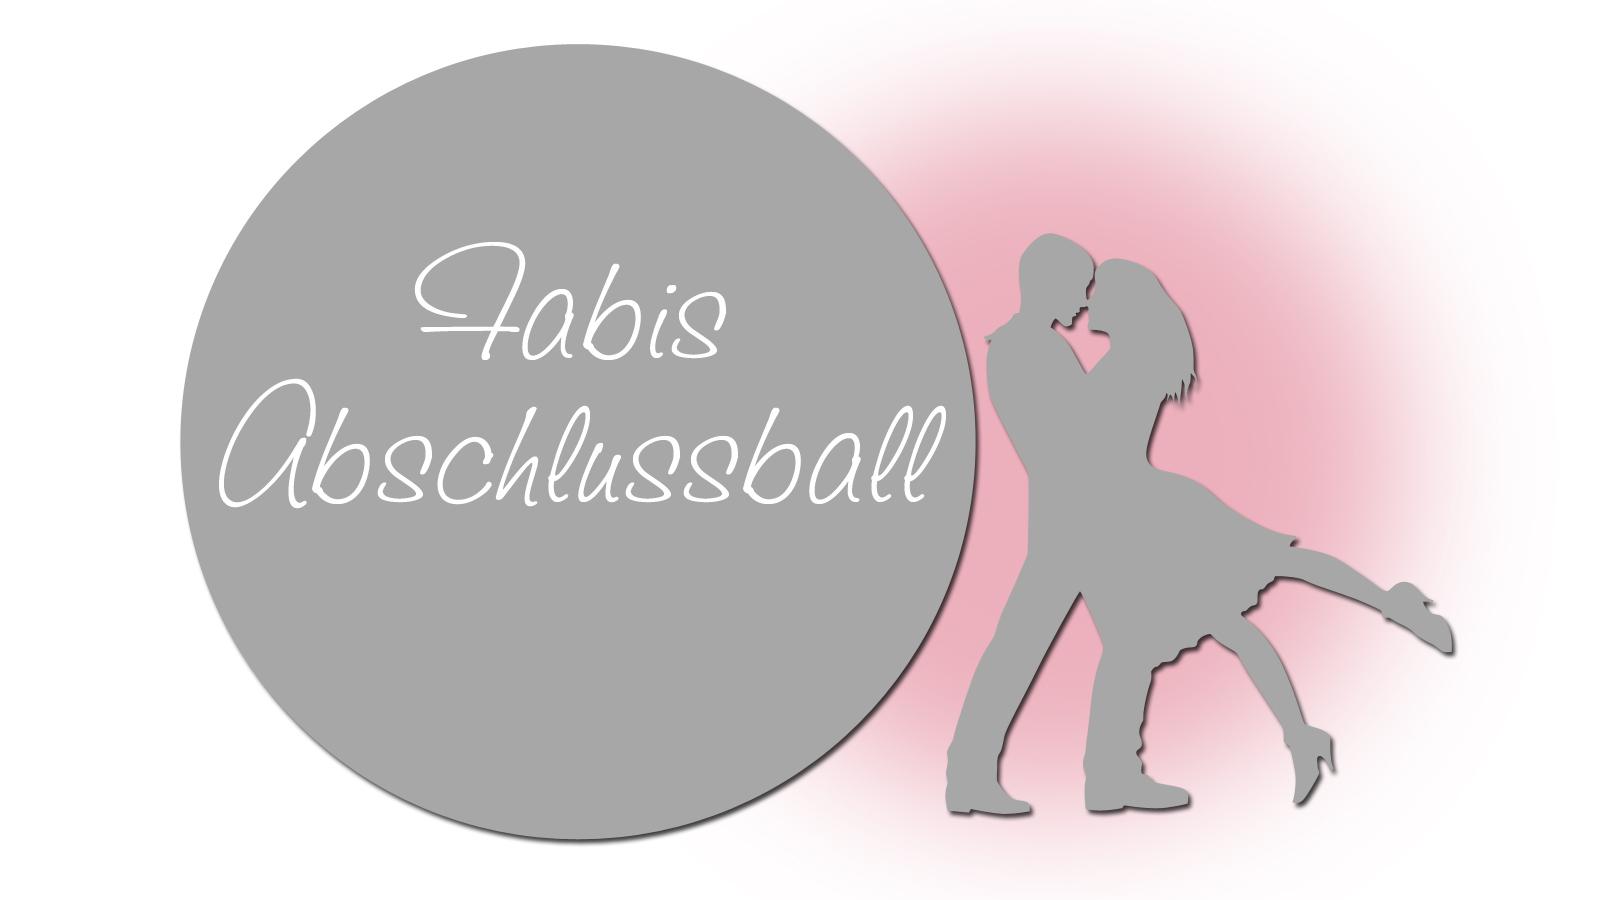 Fabis Abschlussball Image